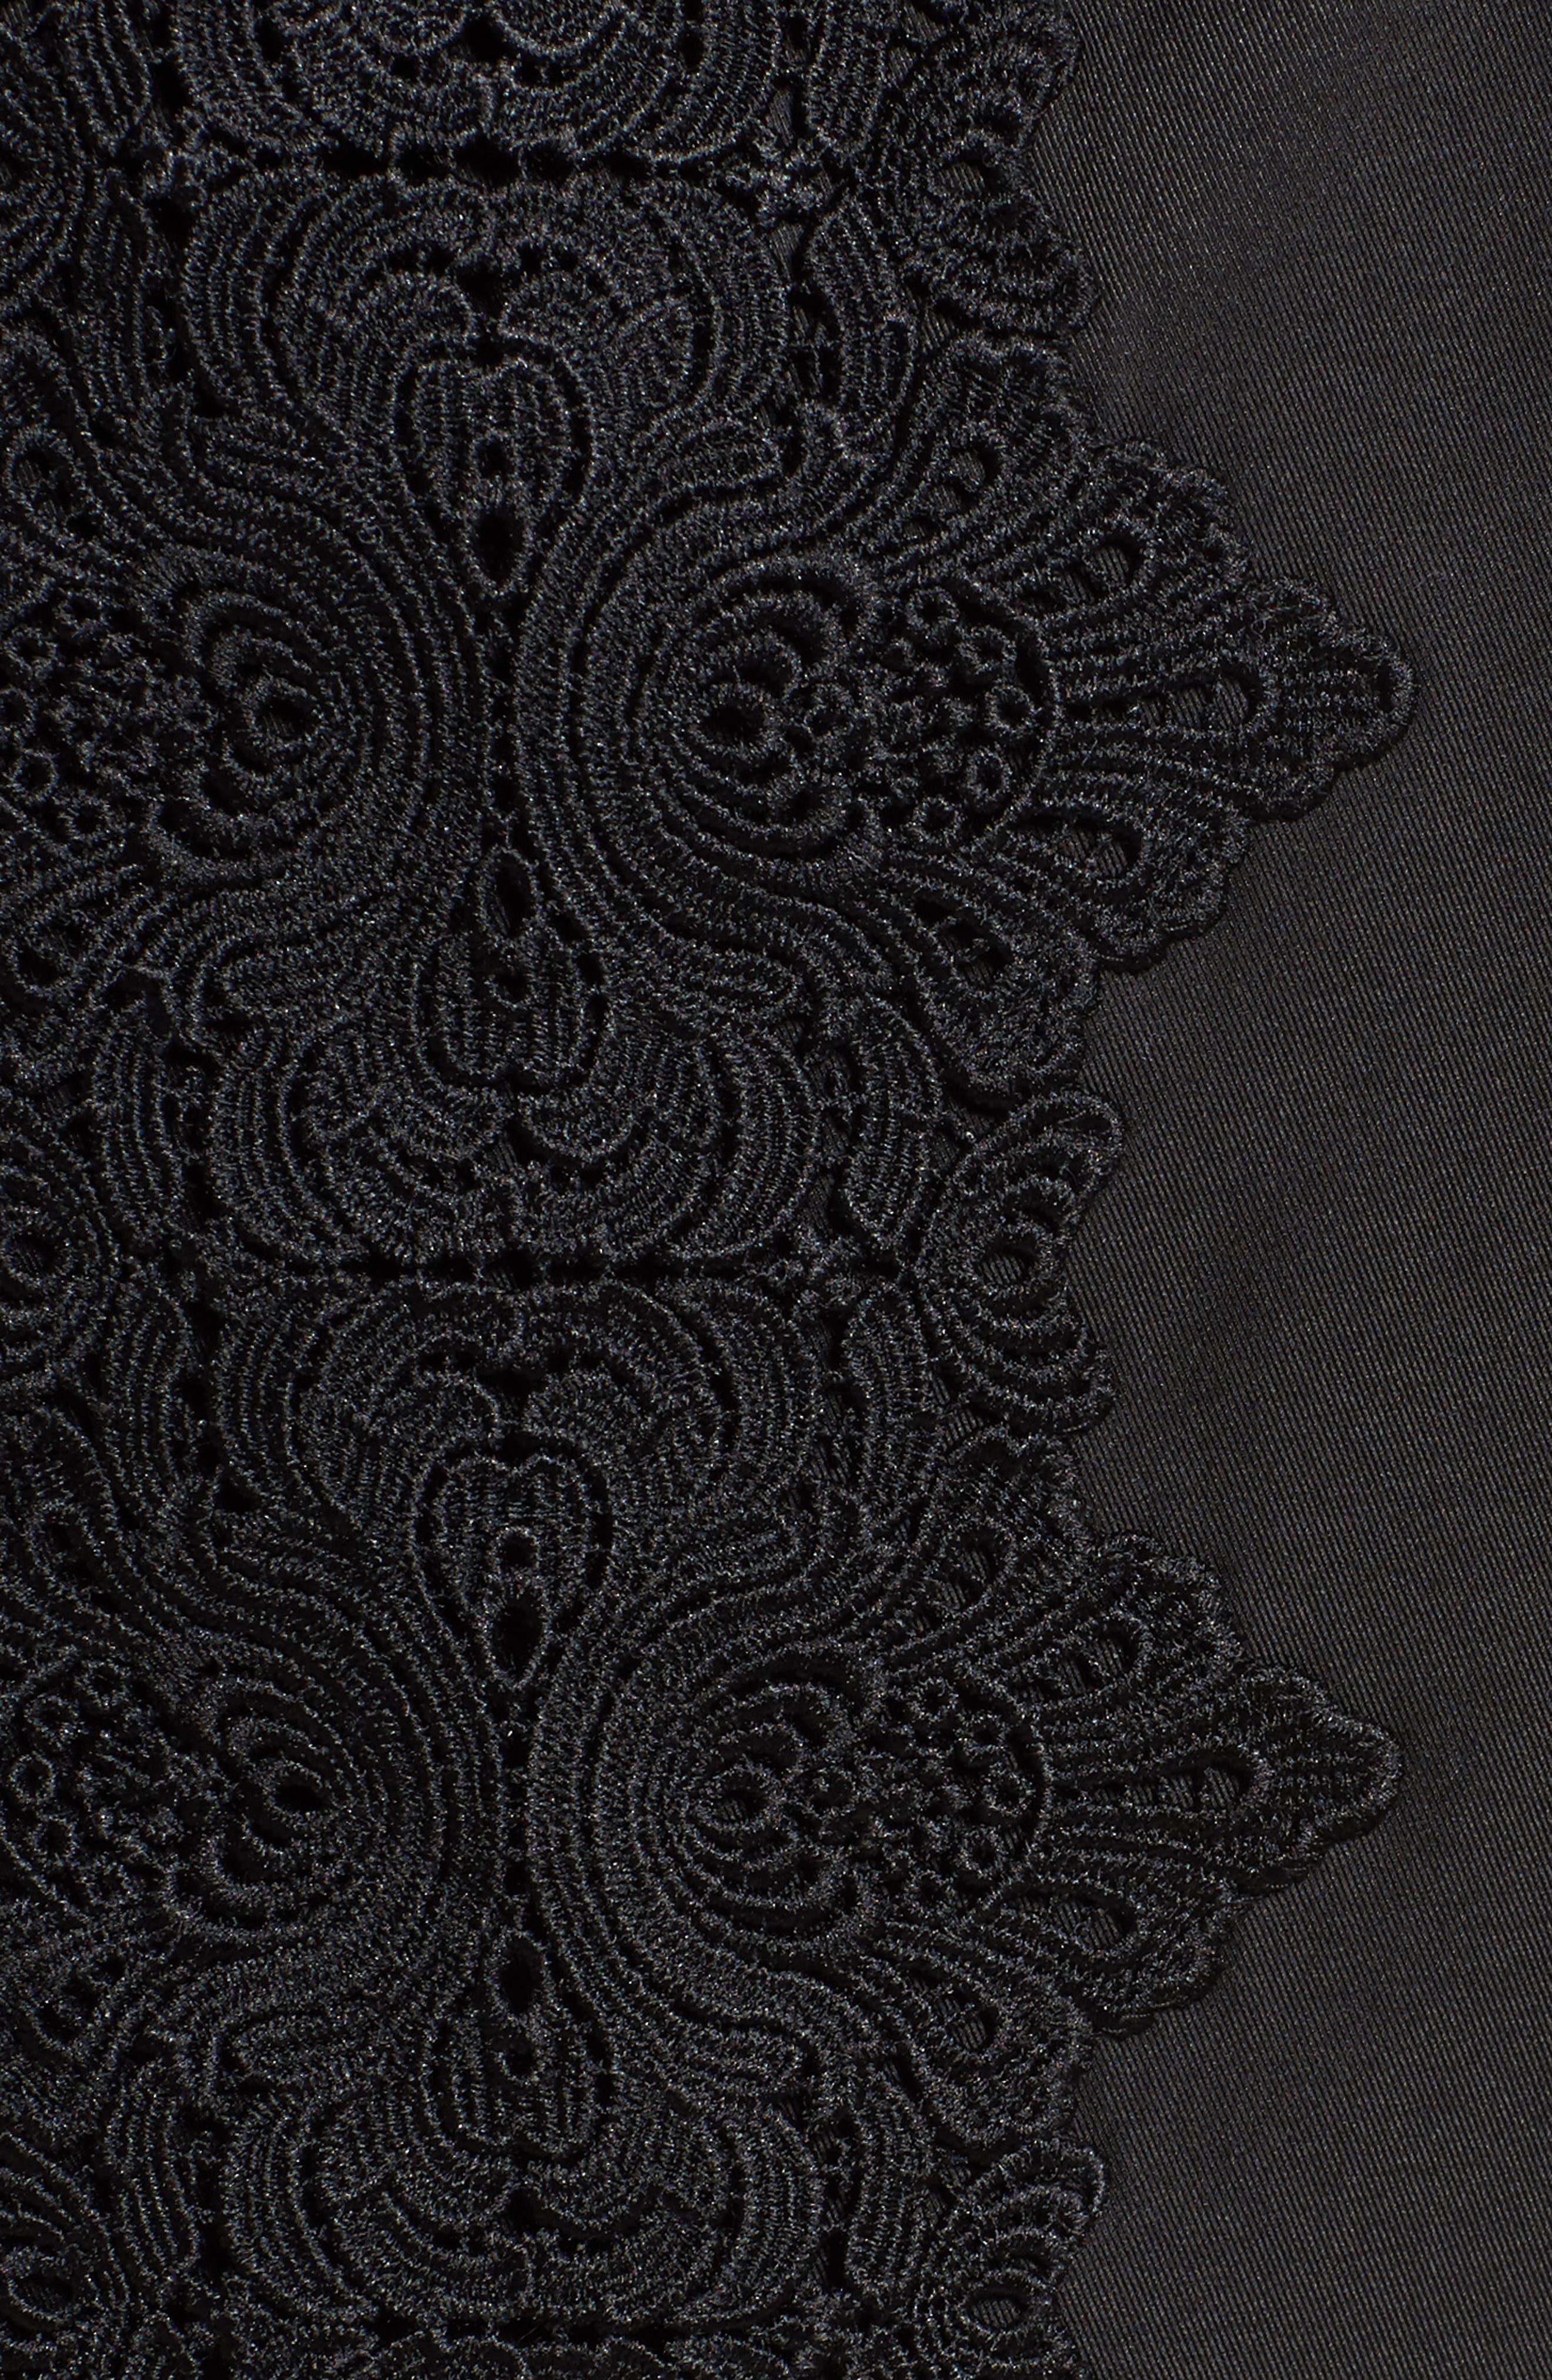 Lace Detail Anorak Jacket,                             Alternate thumbnail 6, color,                             001